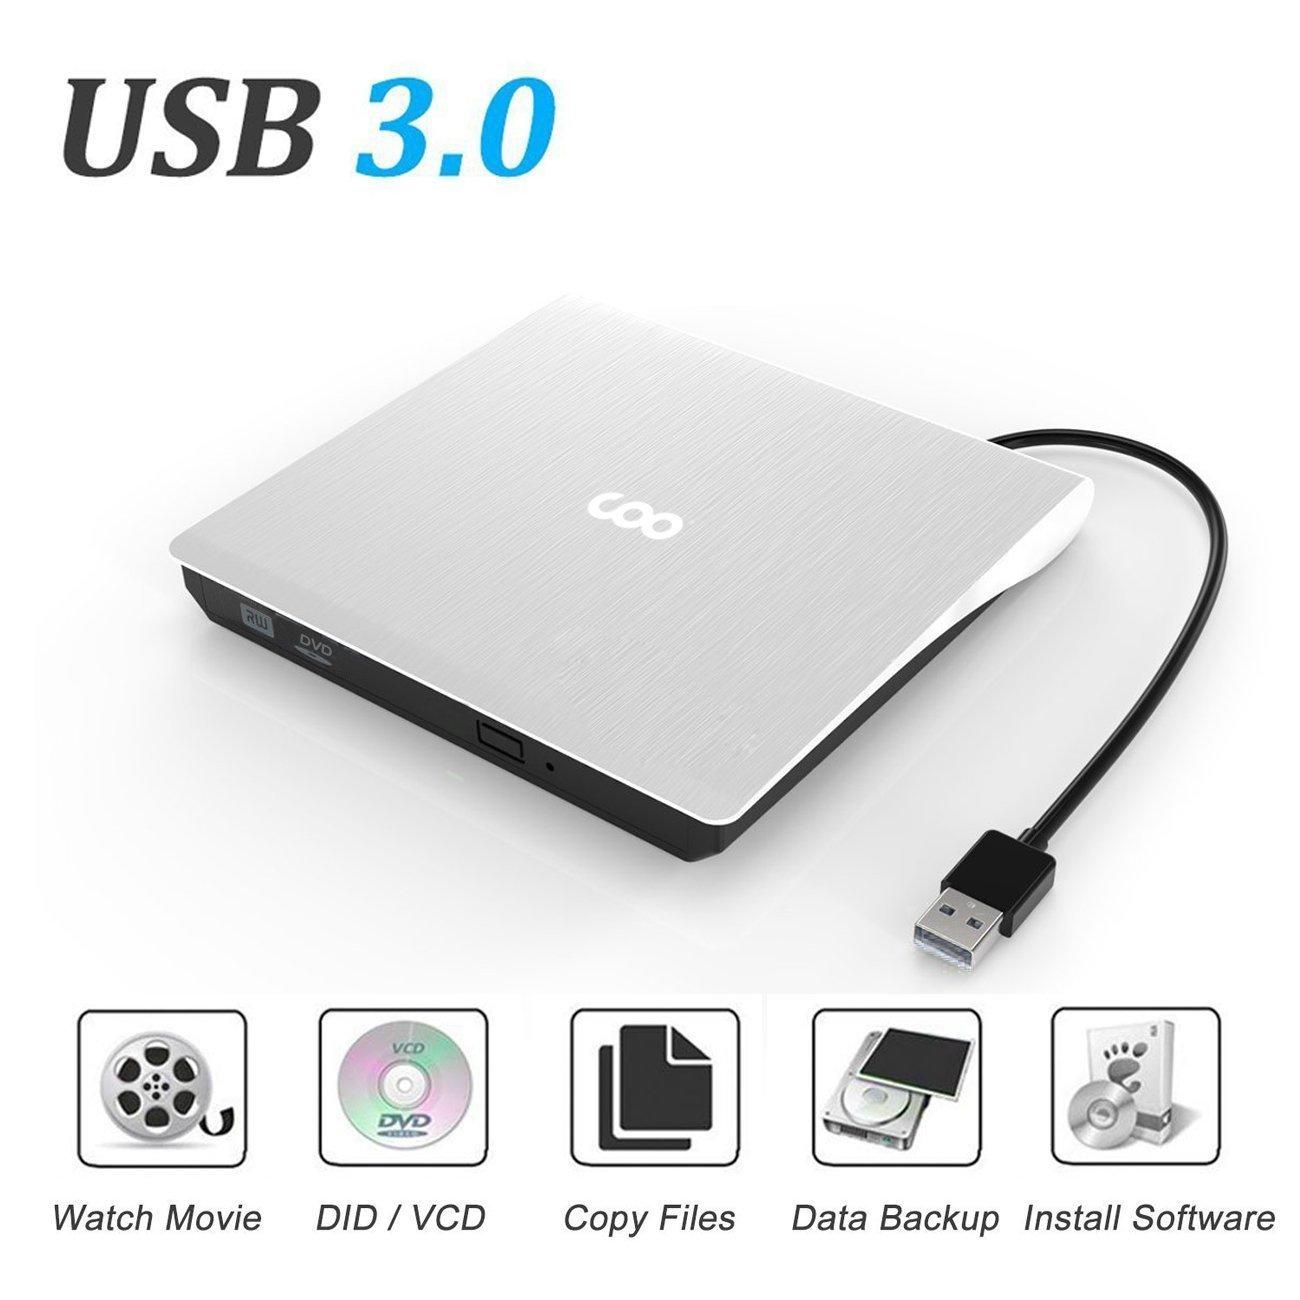 CD Drive, COO USB 3.0 External CD Drive Portable CD DVD +/-RW Drive Slim DVD/CD ROM Rewriter Burner High Speed Data Transfer External DVD Drive for Laptop MacBook Pro/Desktop Windows 7/8/10 (White)